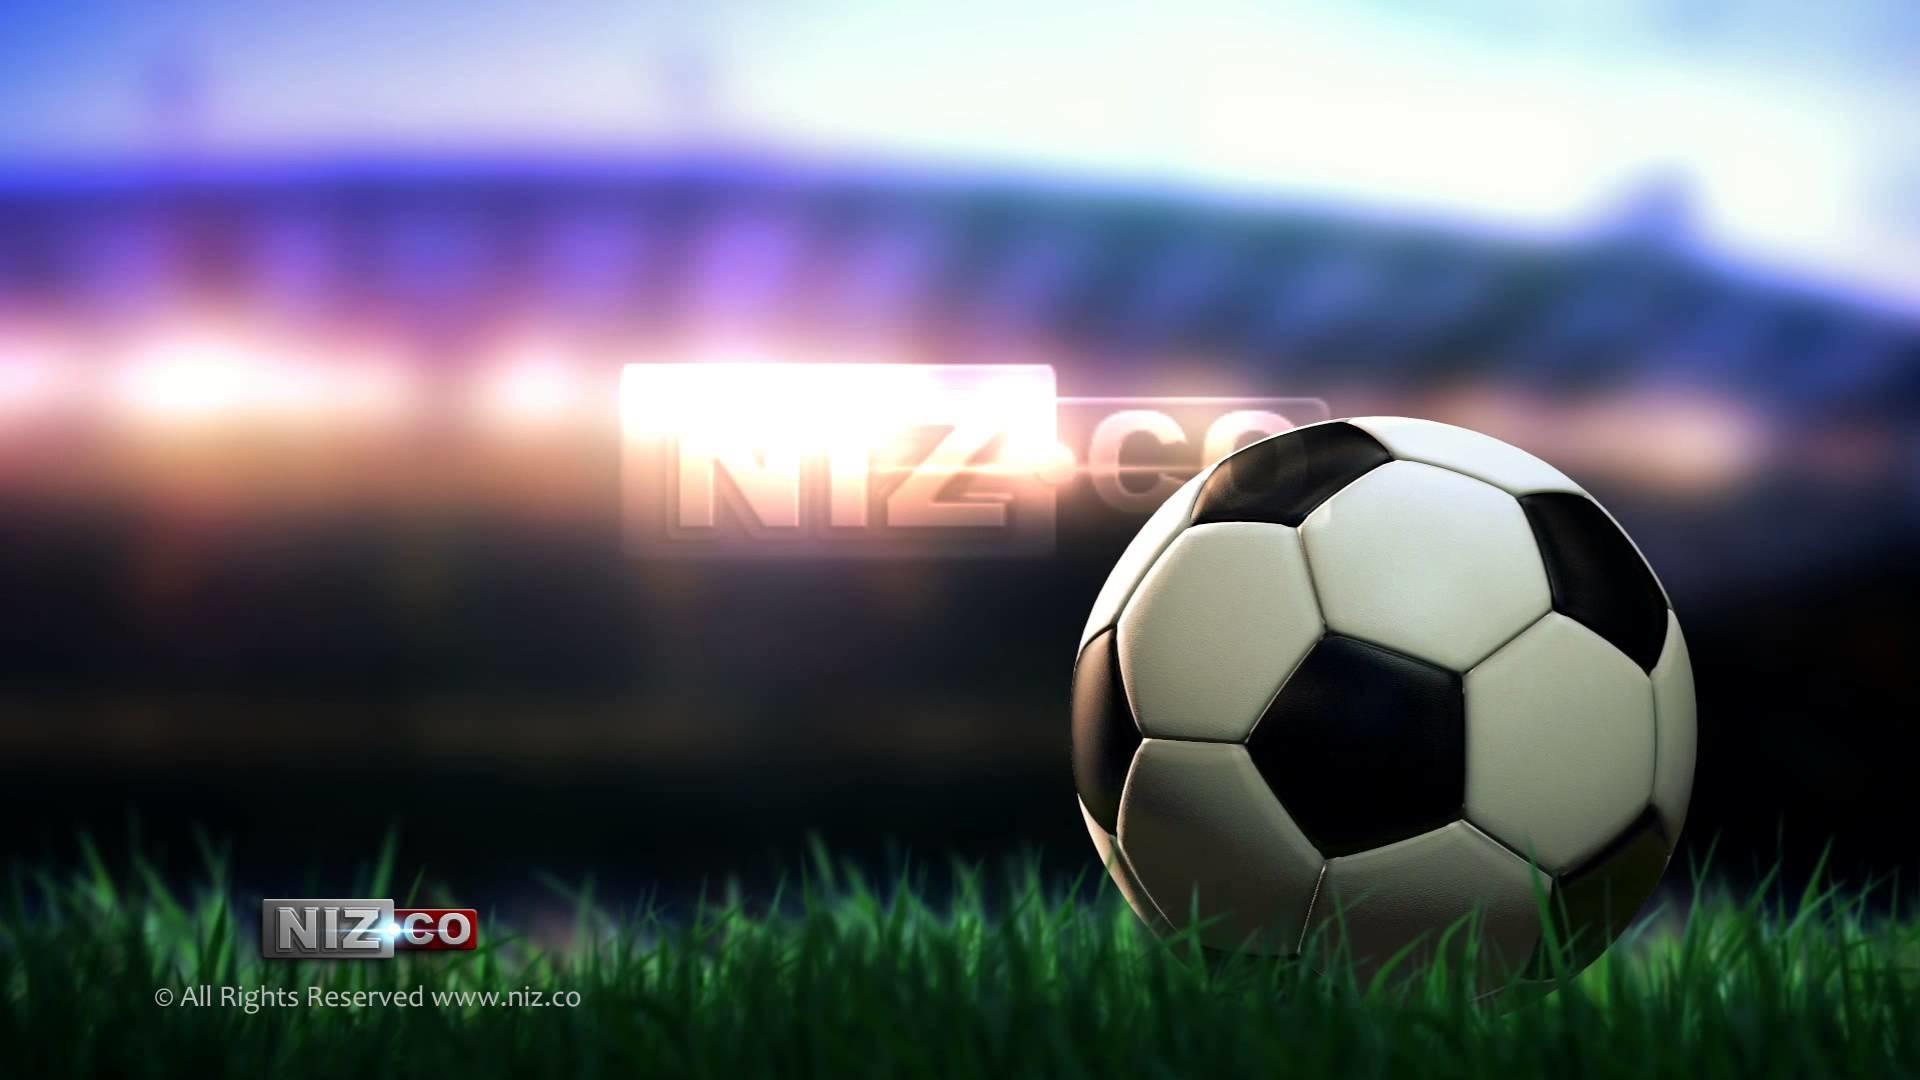 Soccer Background Images (39+ images)